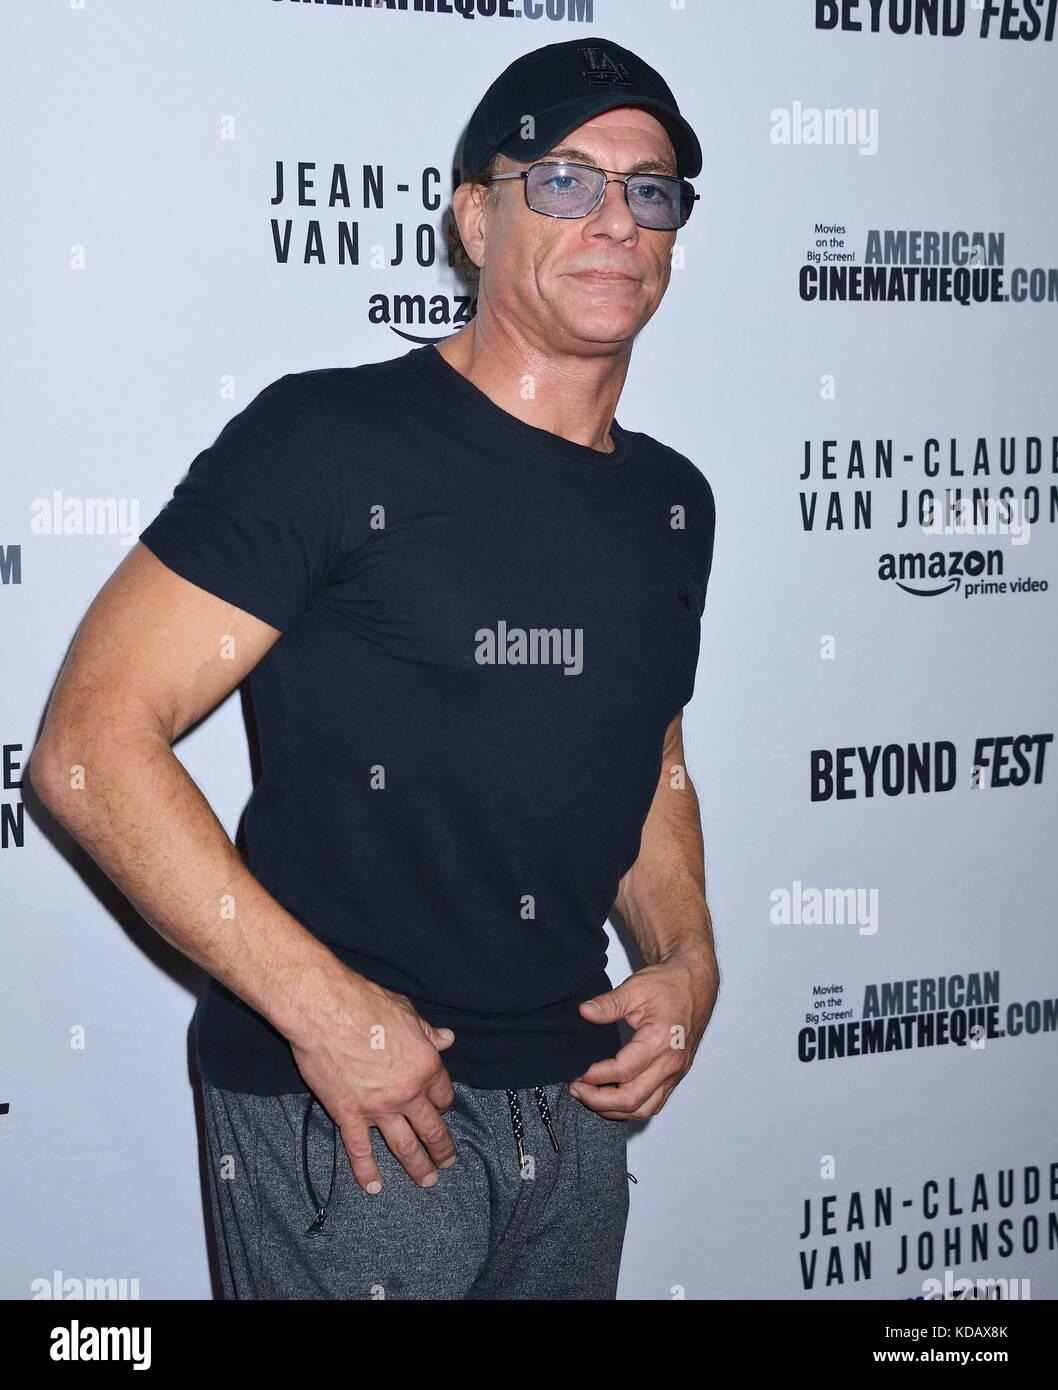 Jean Claude Van Johnson : claude, johnson, Claude, Damme, Arriving, Johnson, Stock, Photo, Alamy